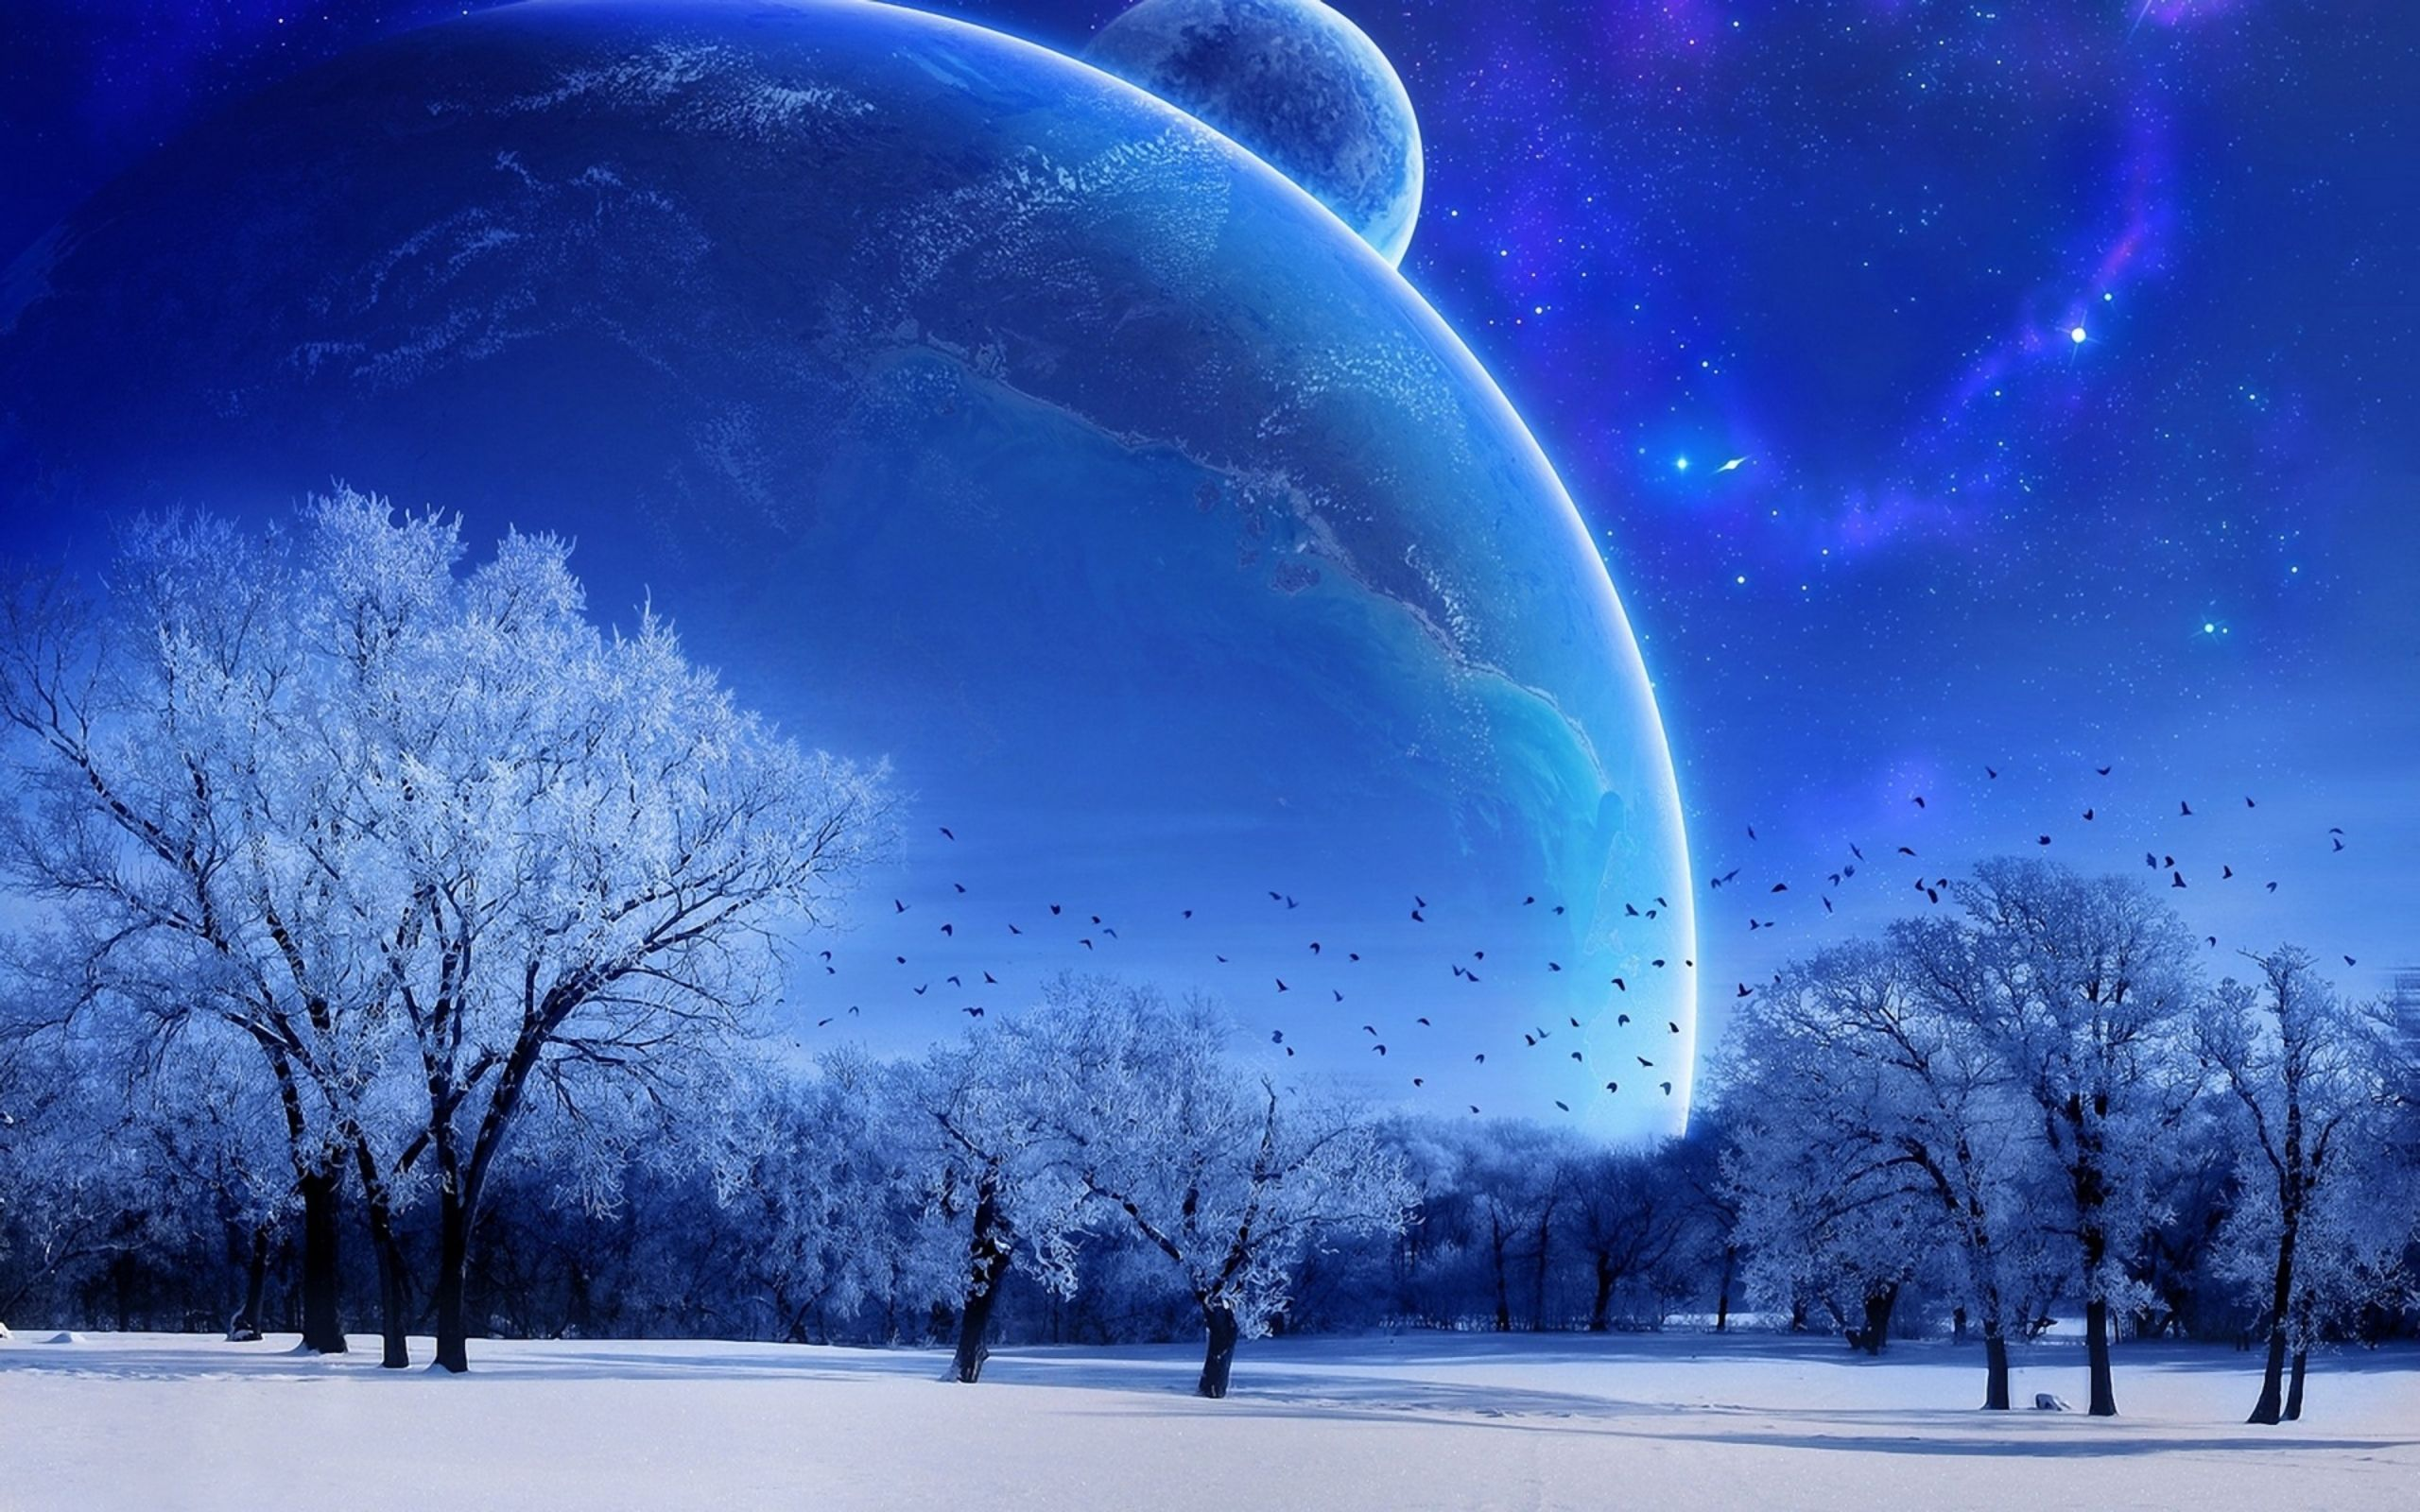 Most Beautiful Wallpapers Ever Fantastische Winter Landschaft 2560x1600 Wallpaper Kostenloser Winter Wallpaper Nature Wallpaper Planets Wallpaper